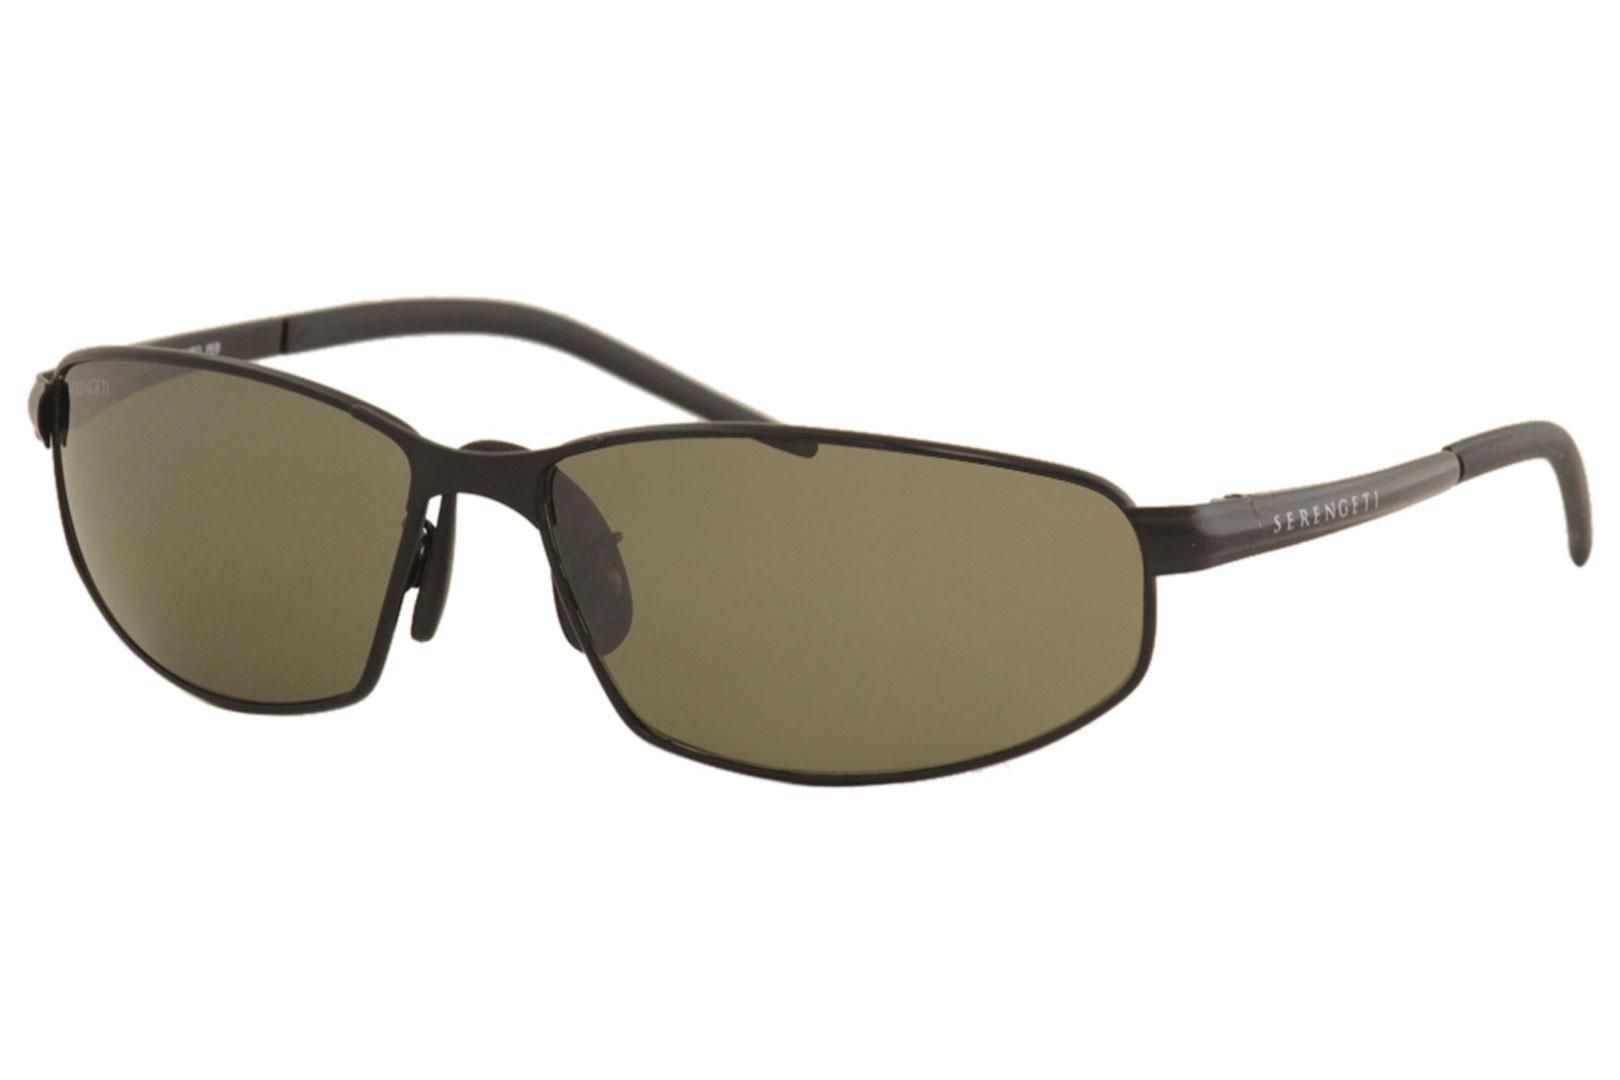 Image of Serengeti Granada 7301 Sunglasses Satin Black Polarized Shades